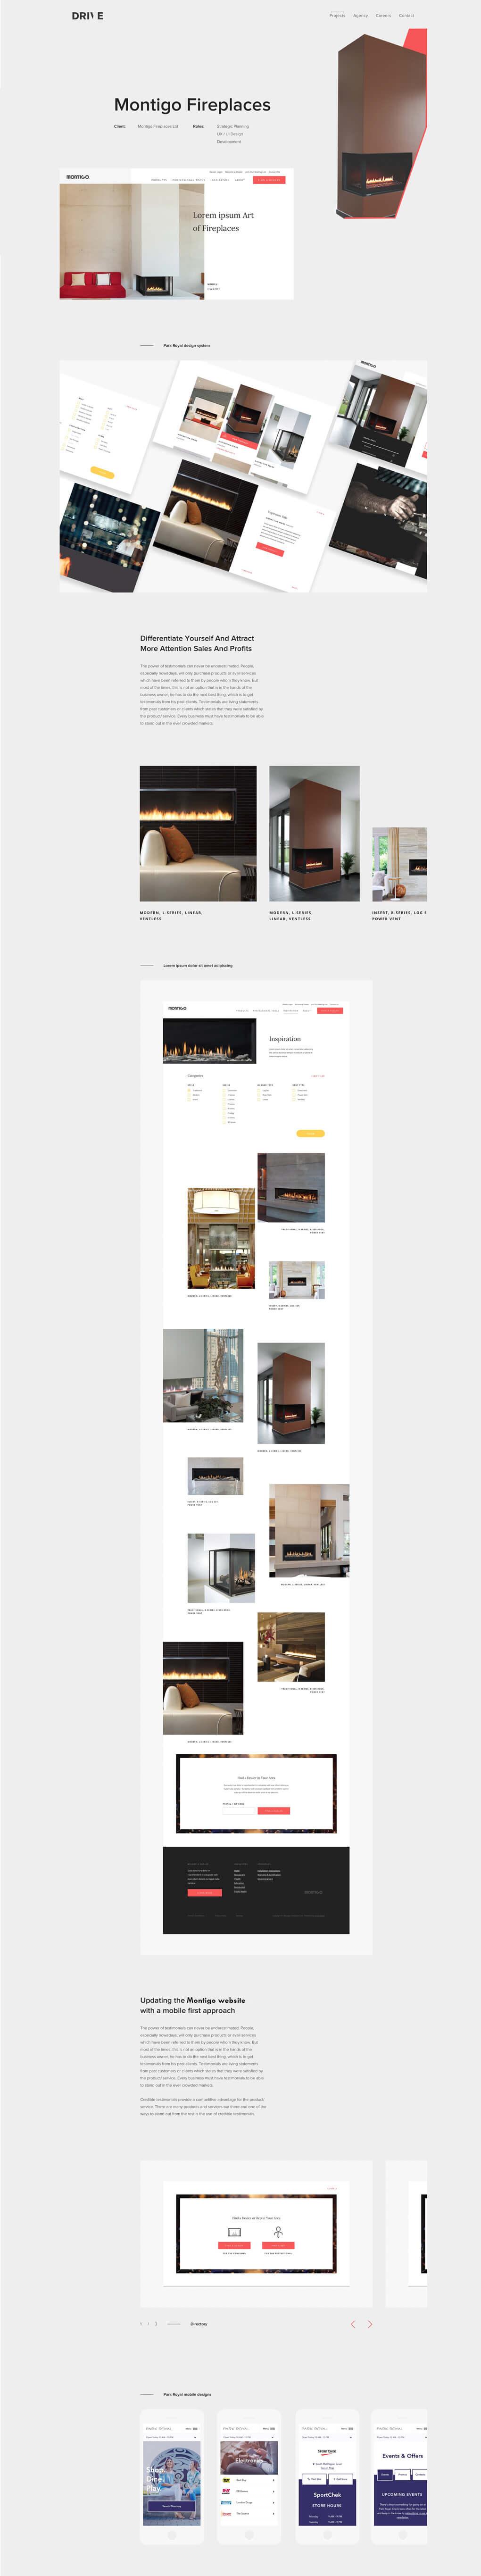 screenshot of Montigo Fireplaces case study web page on Drive Digital website